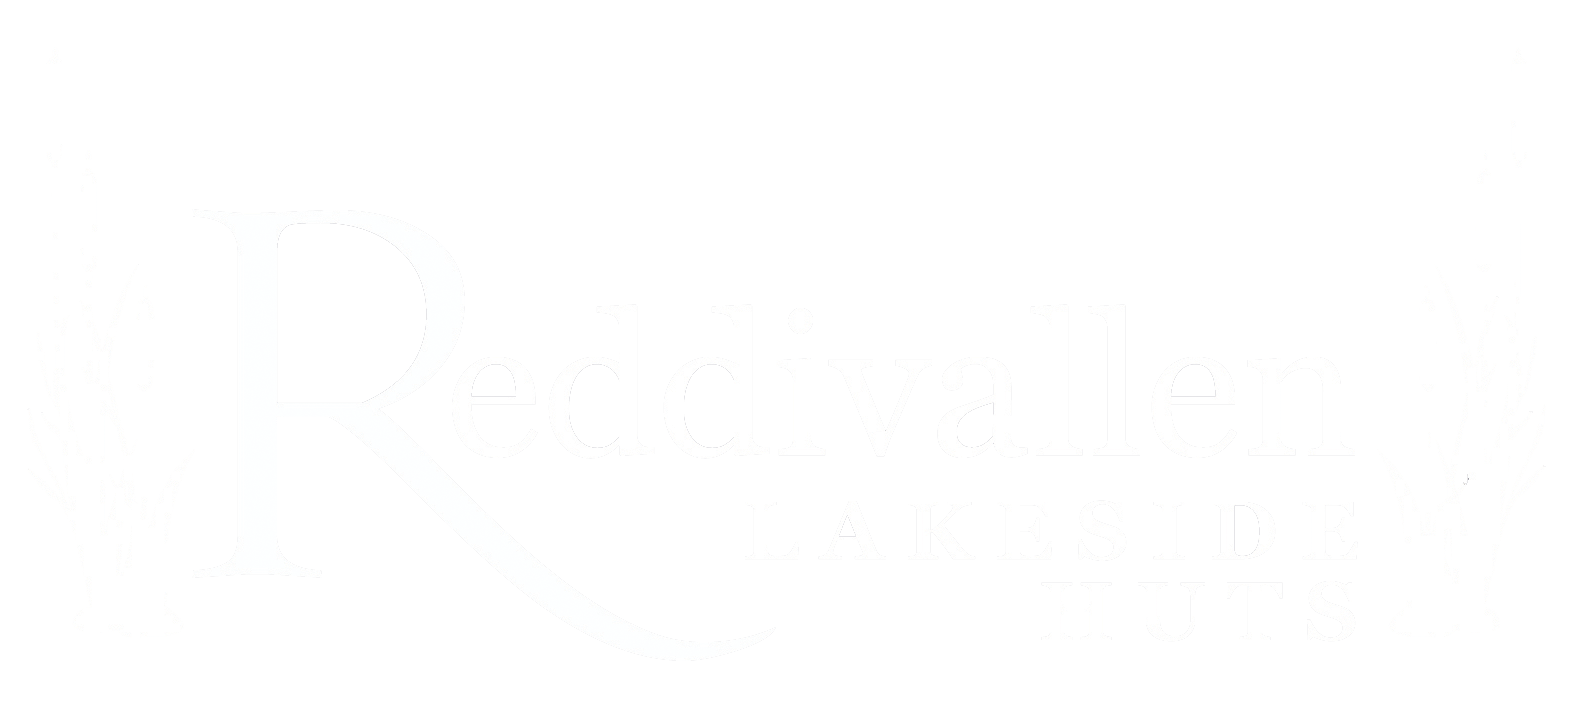 Reddivallen Lakeside Huts